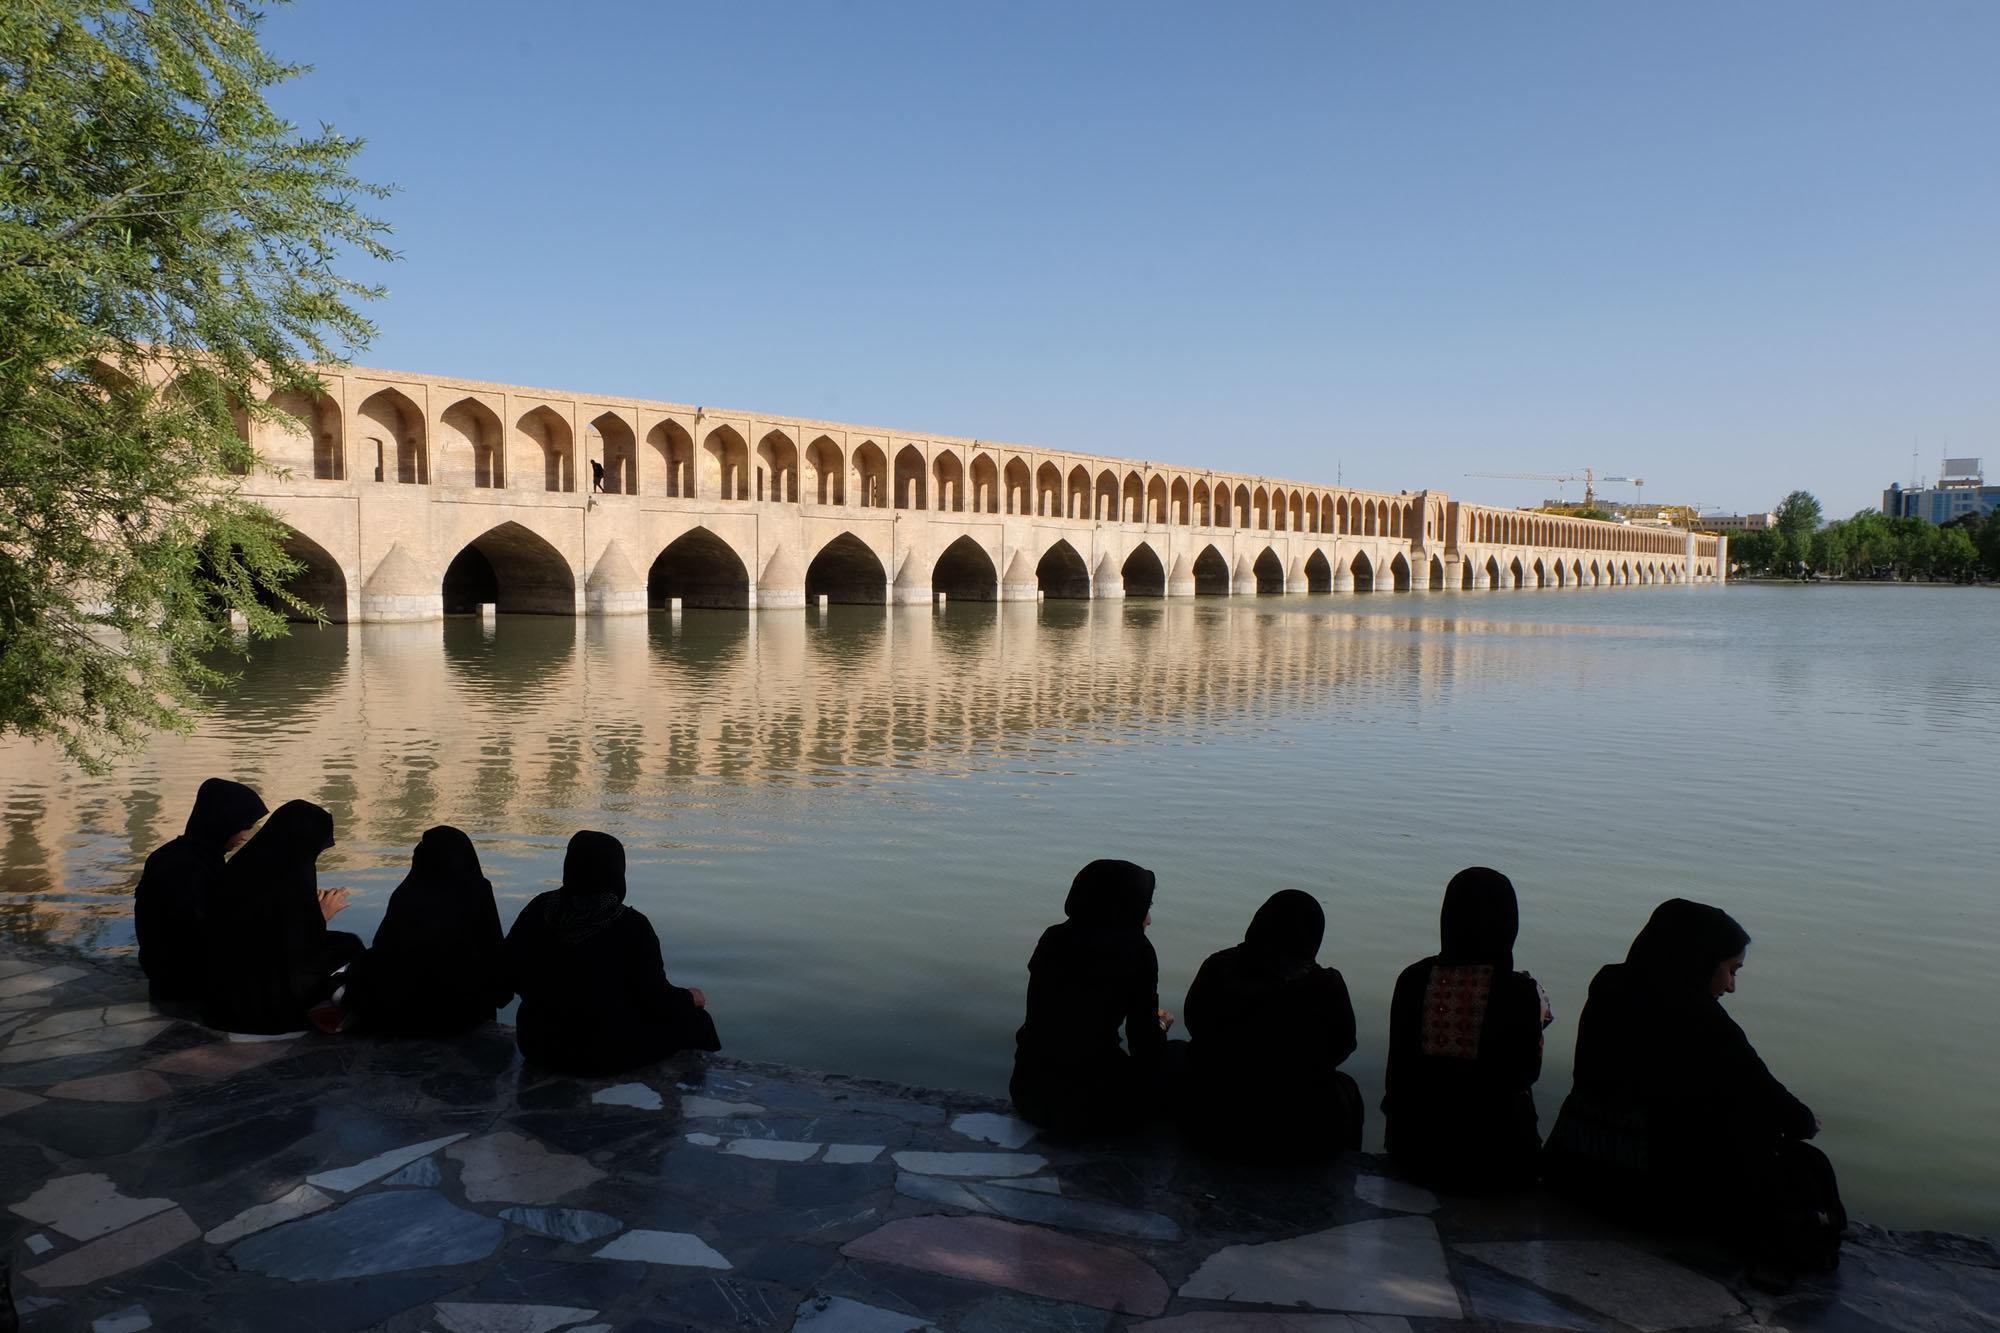 IsfahanBridge.jpg